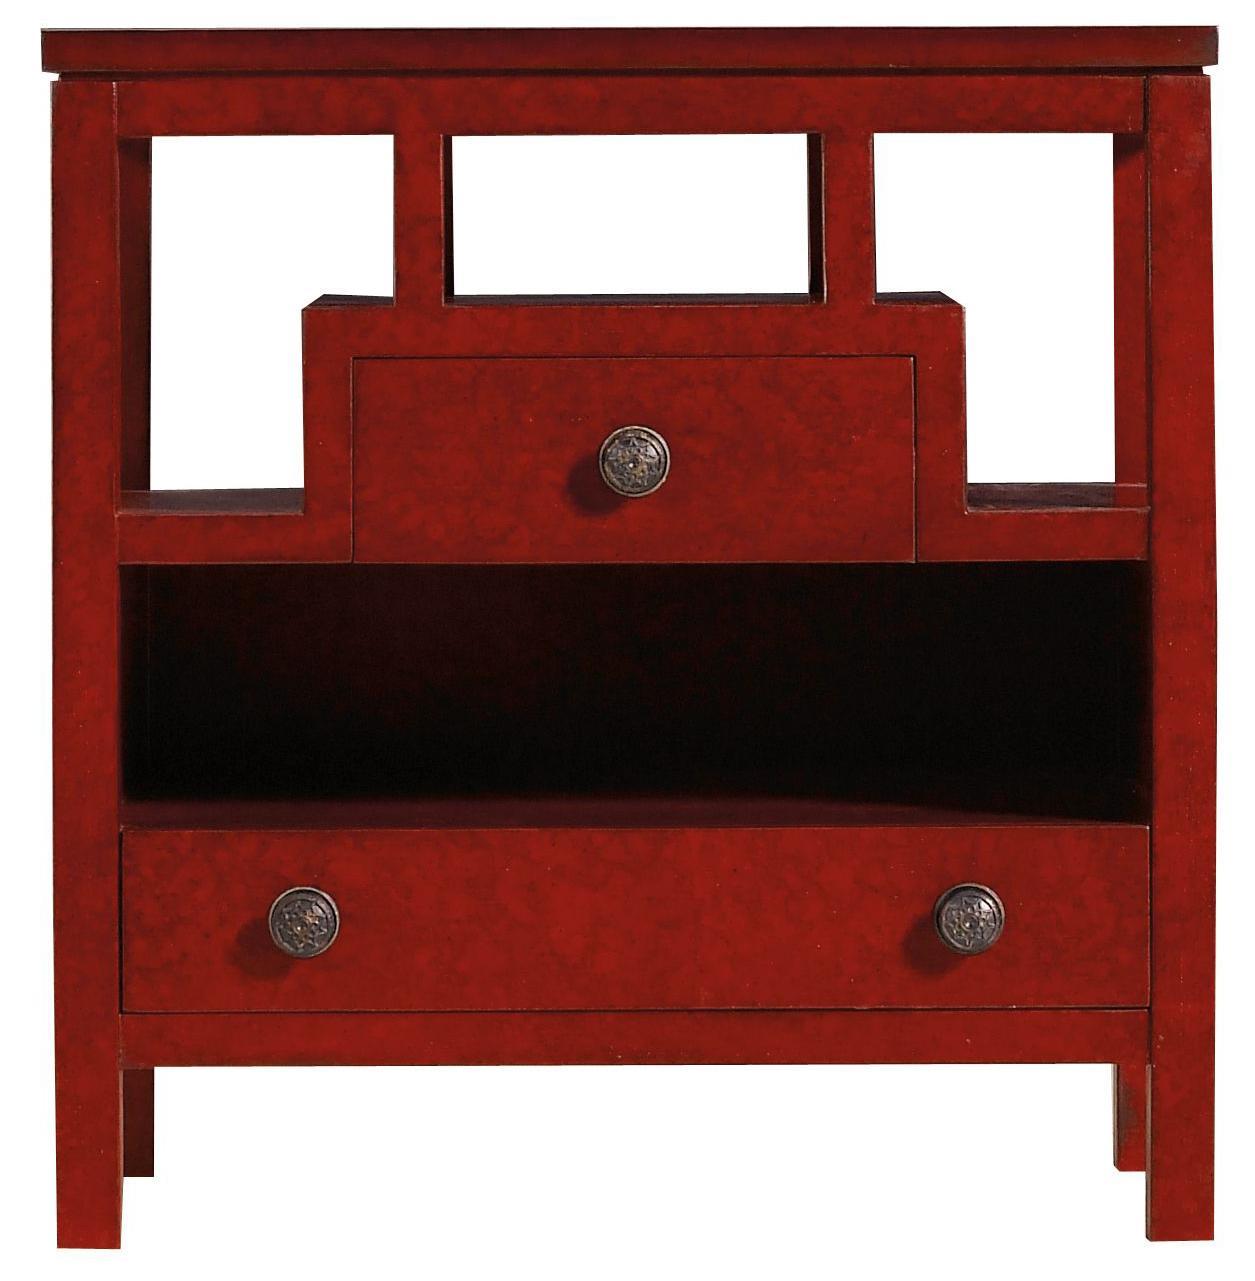 Stanley Furniture Archipelago Bajan Chairside Chest - Item Number: 186-35-10